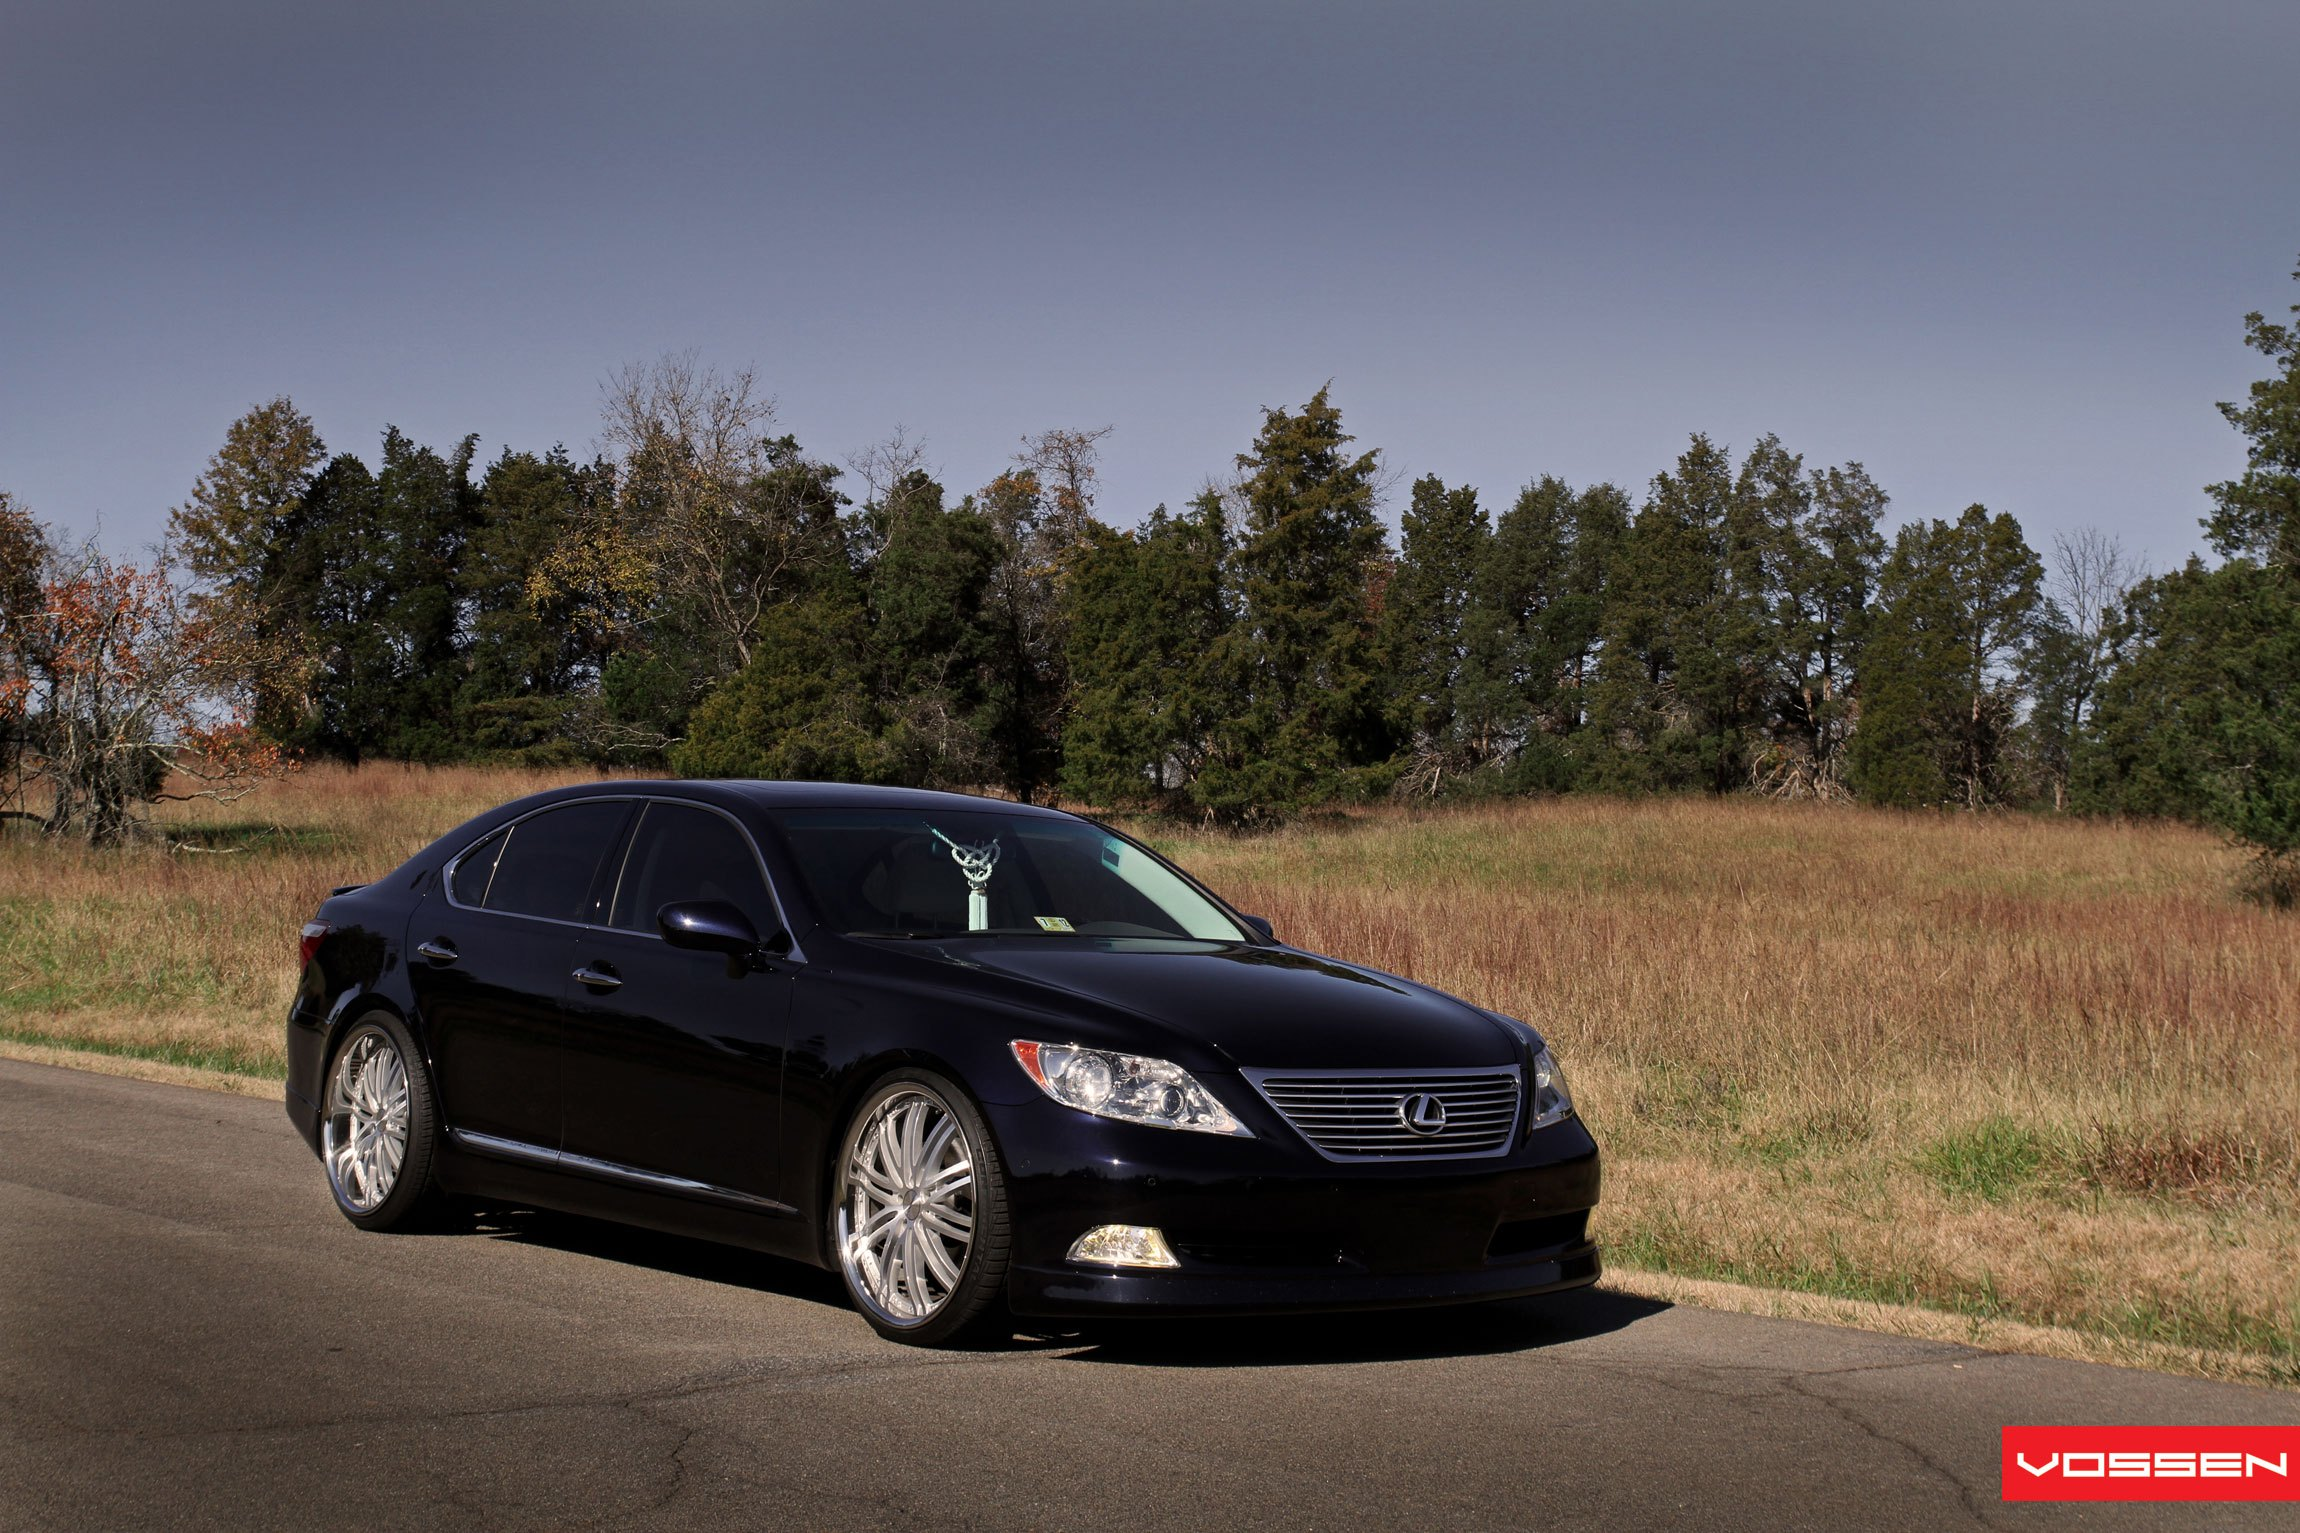 Drop of Luxury Black Lexus LS460 Enhanced by Vossen — CARiD